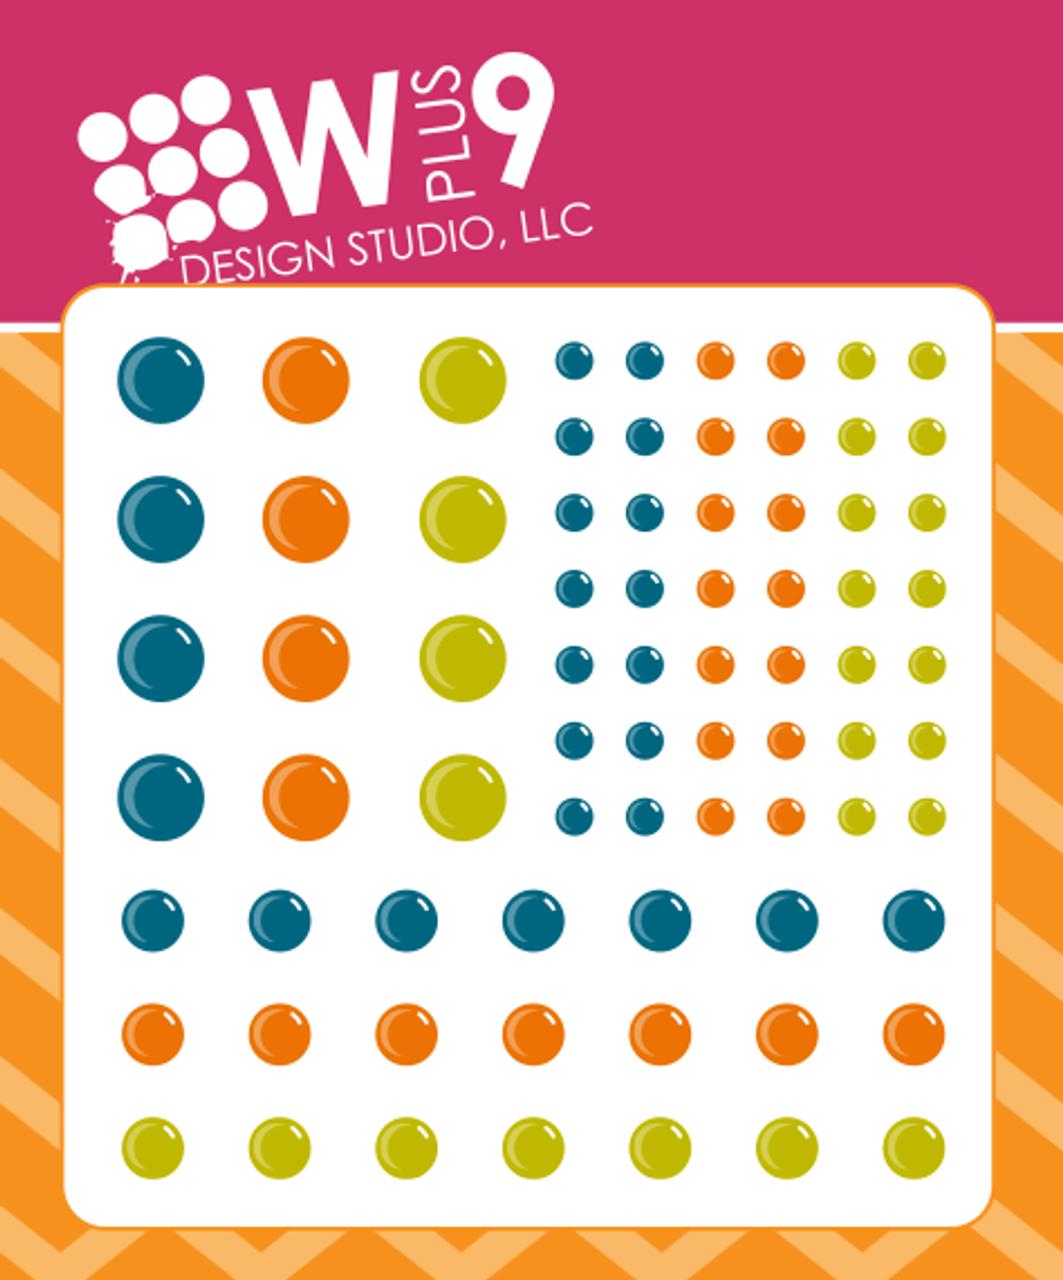 Enamel Dots Autumn Splendor Blue Wplus9 Design Studio Llc